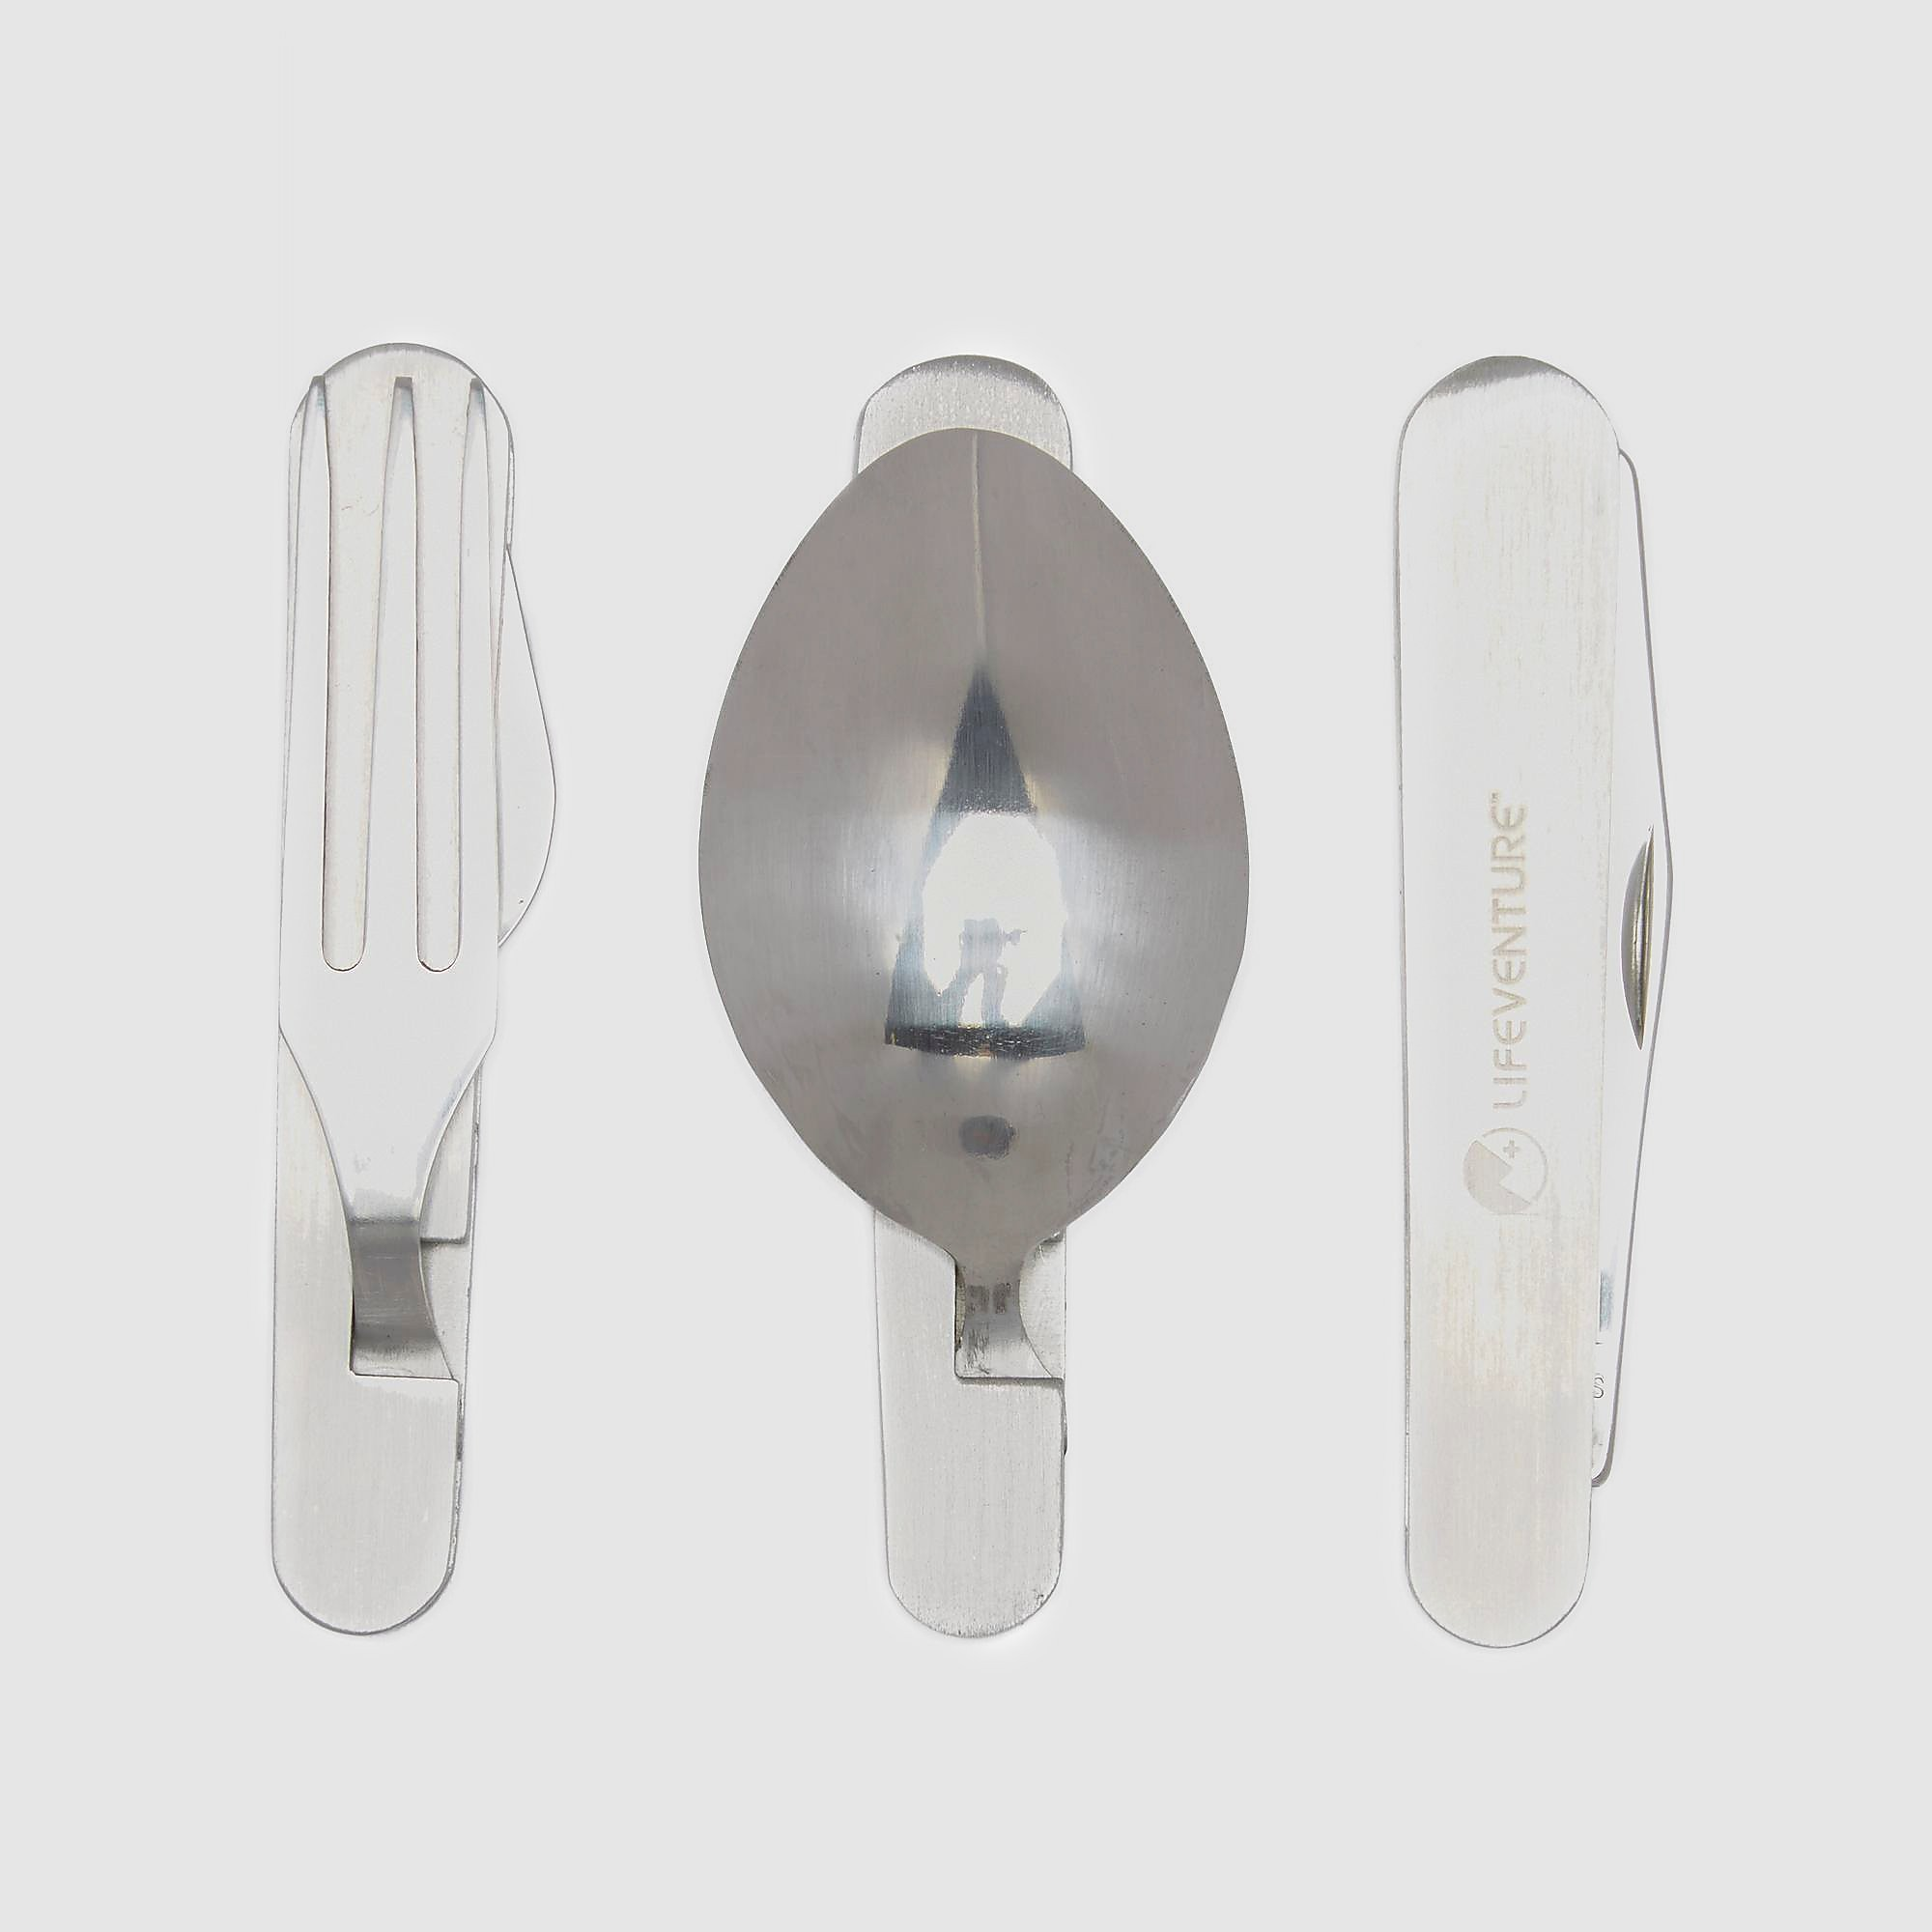 Life & Legend Knife, Fork, Spoon - Folding Cutlery Set